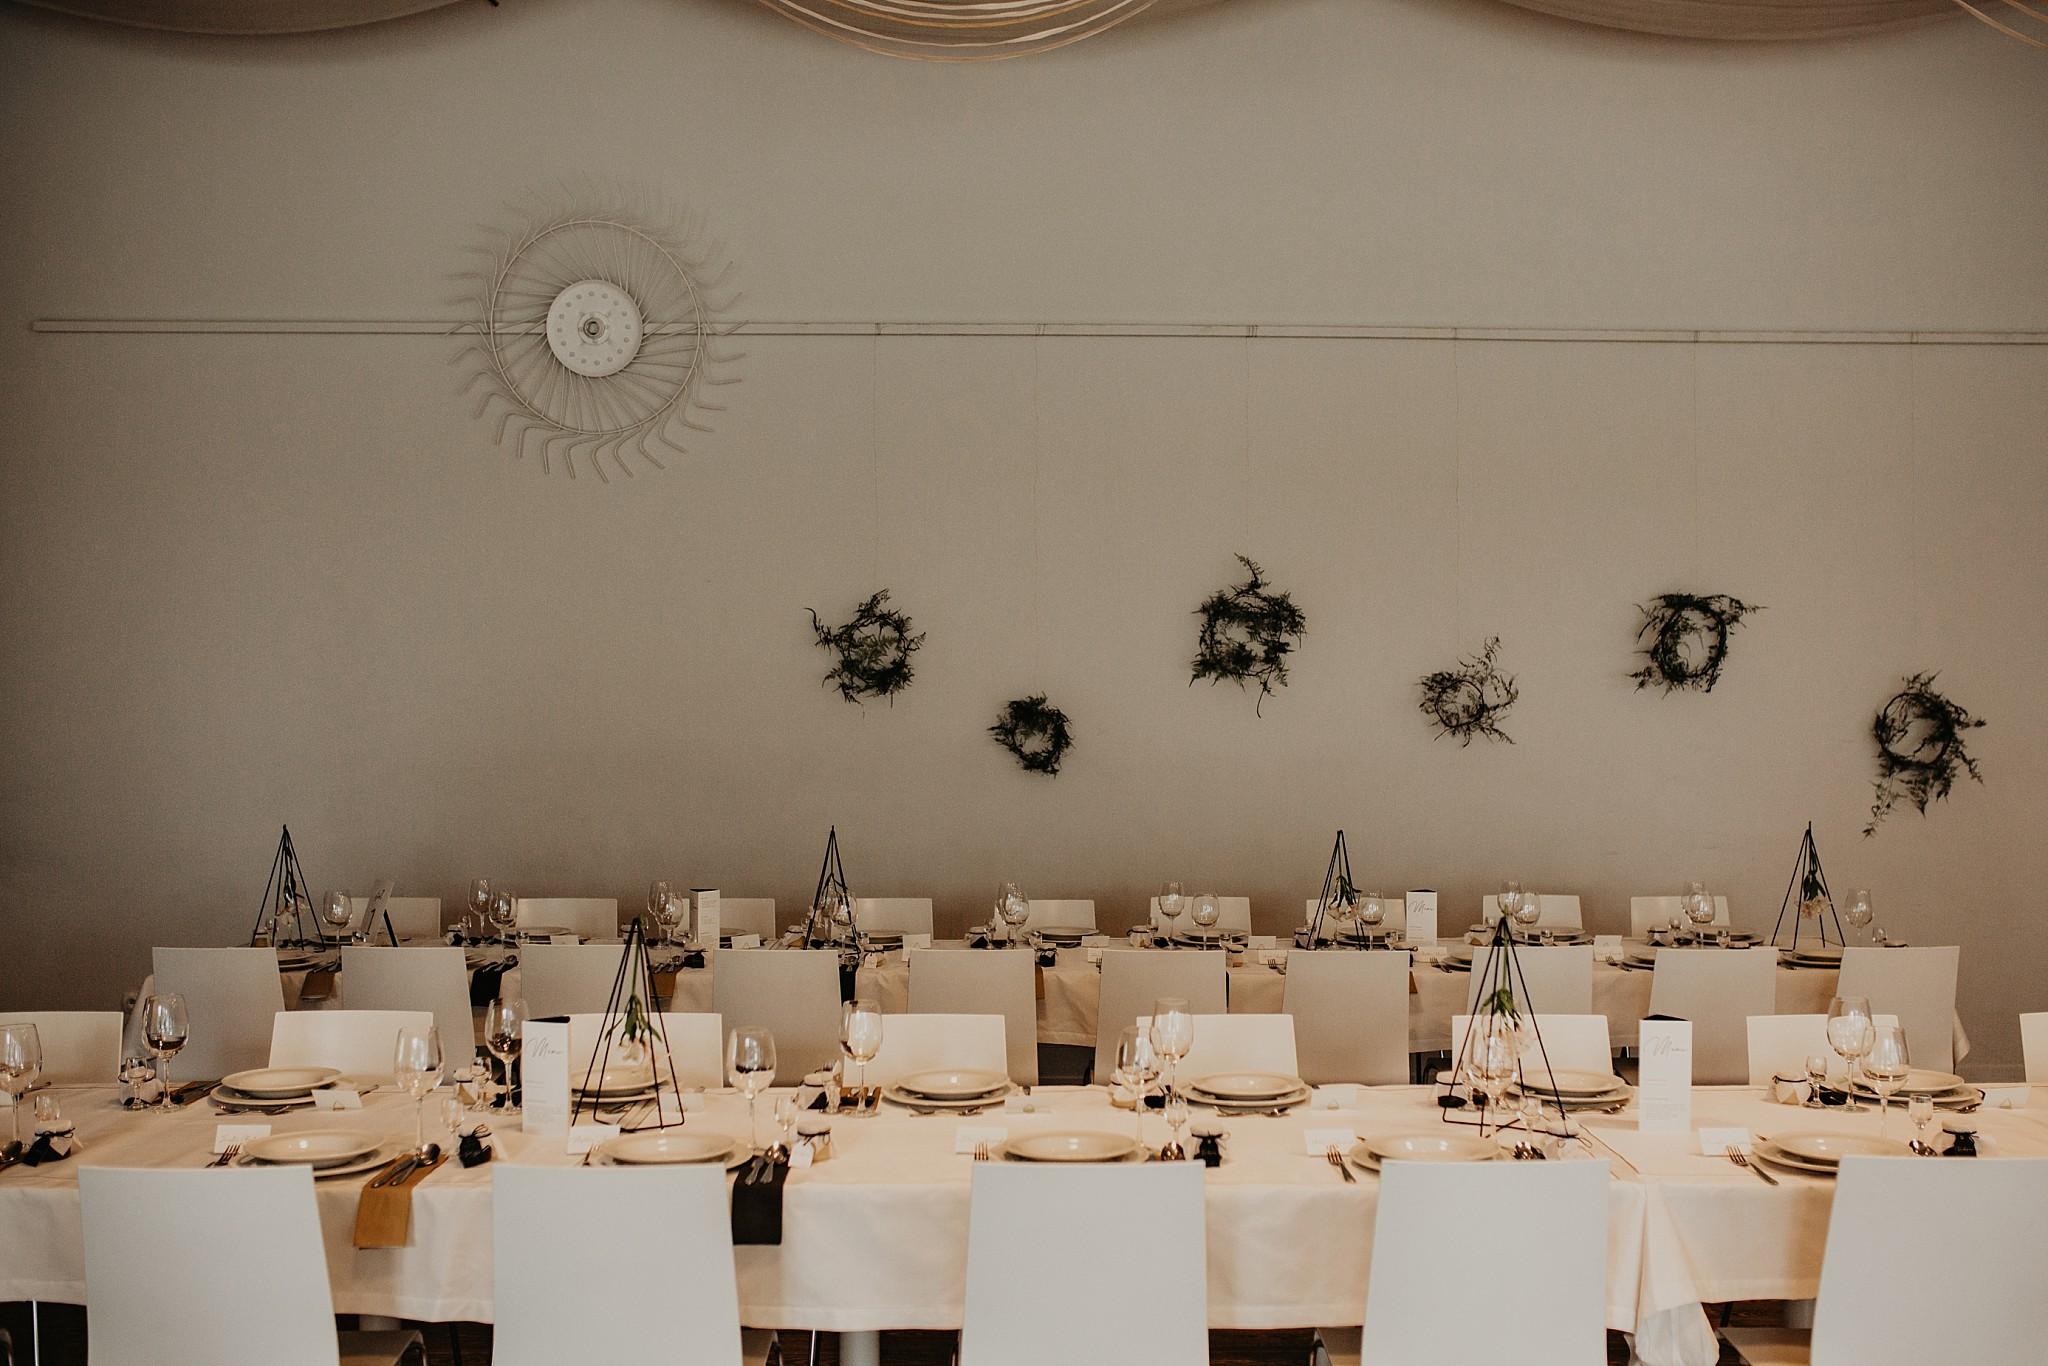 fotograf poznan wesele dobra truskawka piekne wesele pod poznaniem wesele w dobrej truskawce piekna para mloda slub marzen slub koronawirus slub listopad wesele koronawirus 008